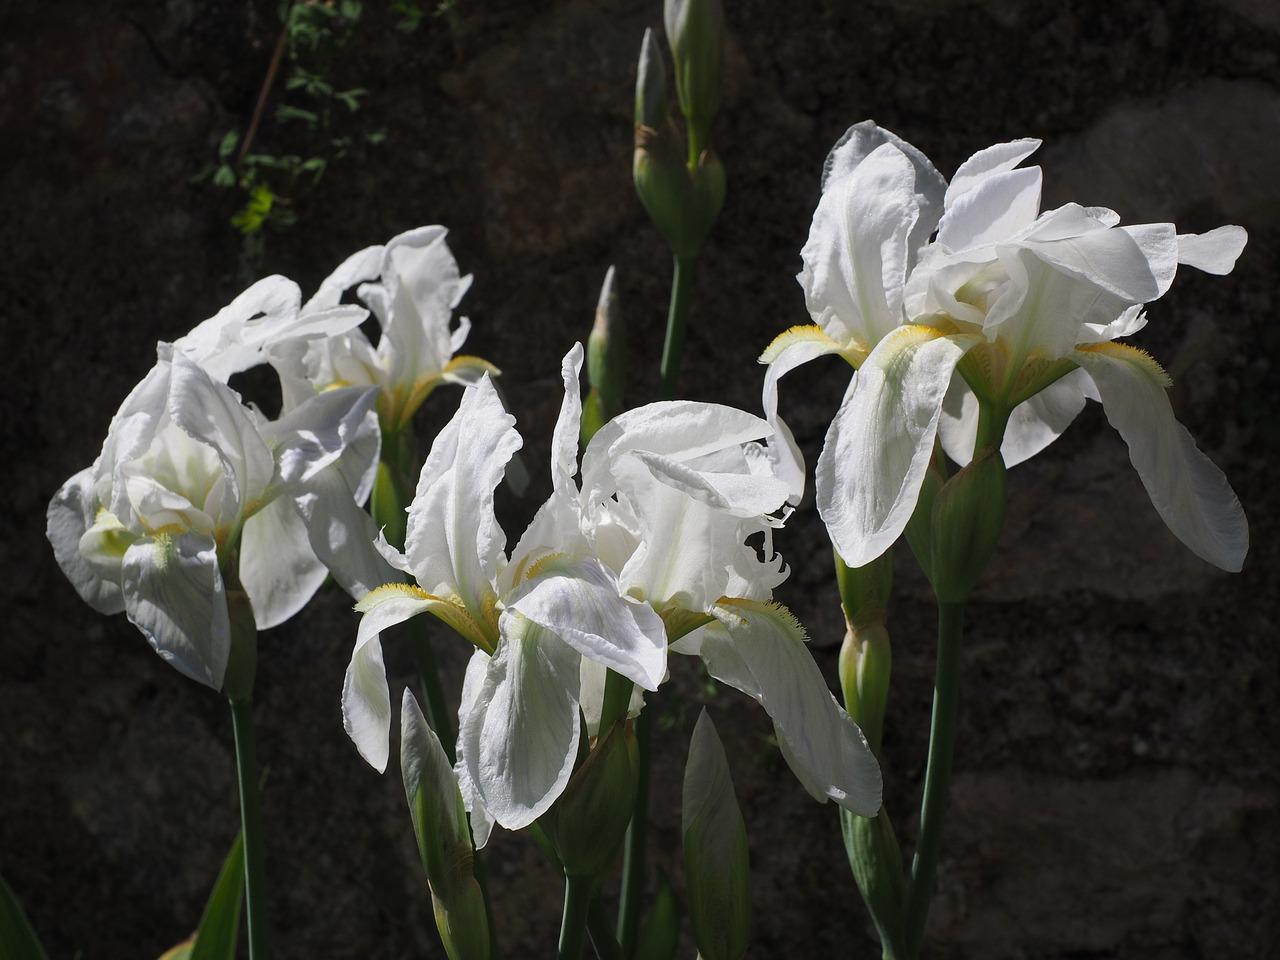 Irislilyflowerblossombloom Free Photo From Needpix